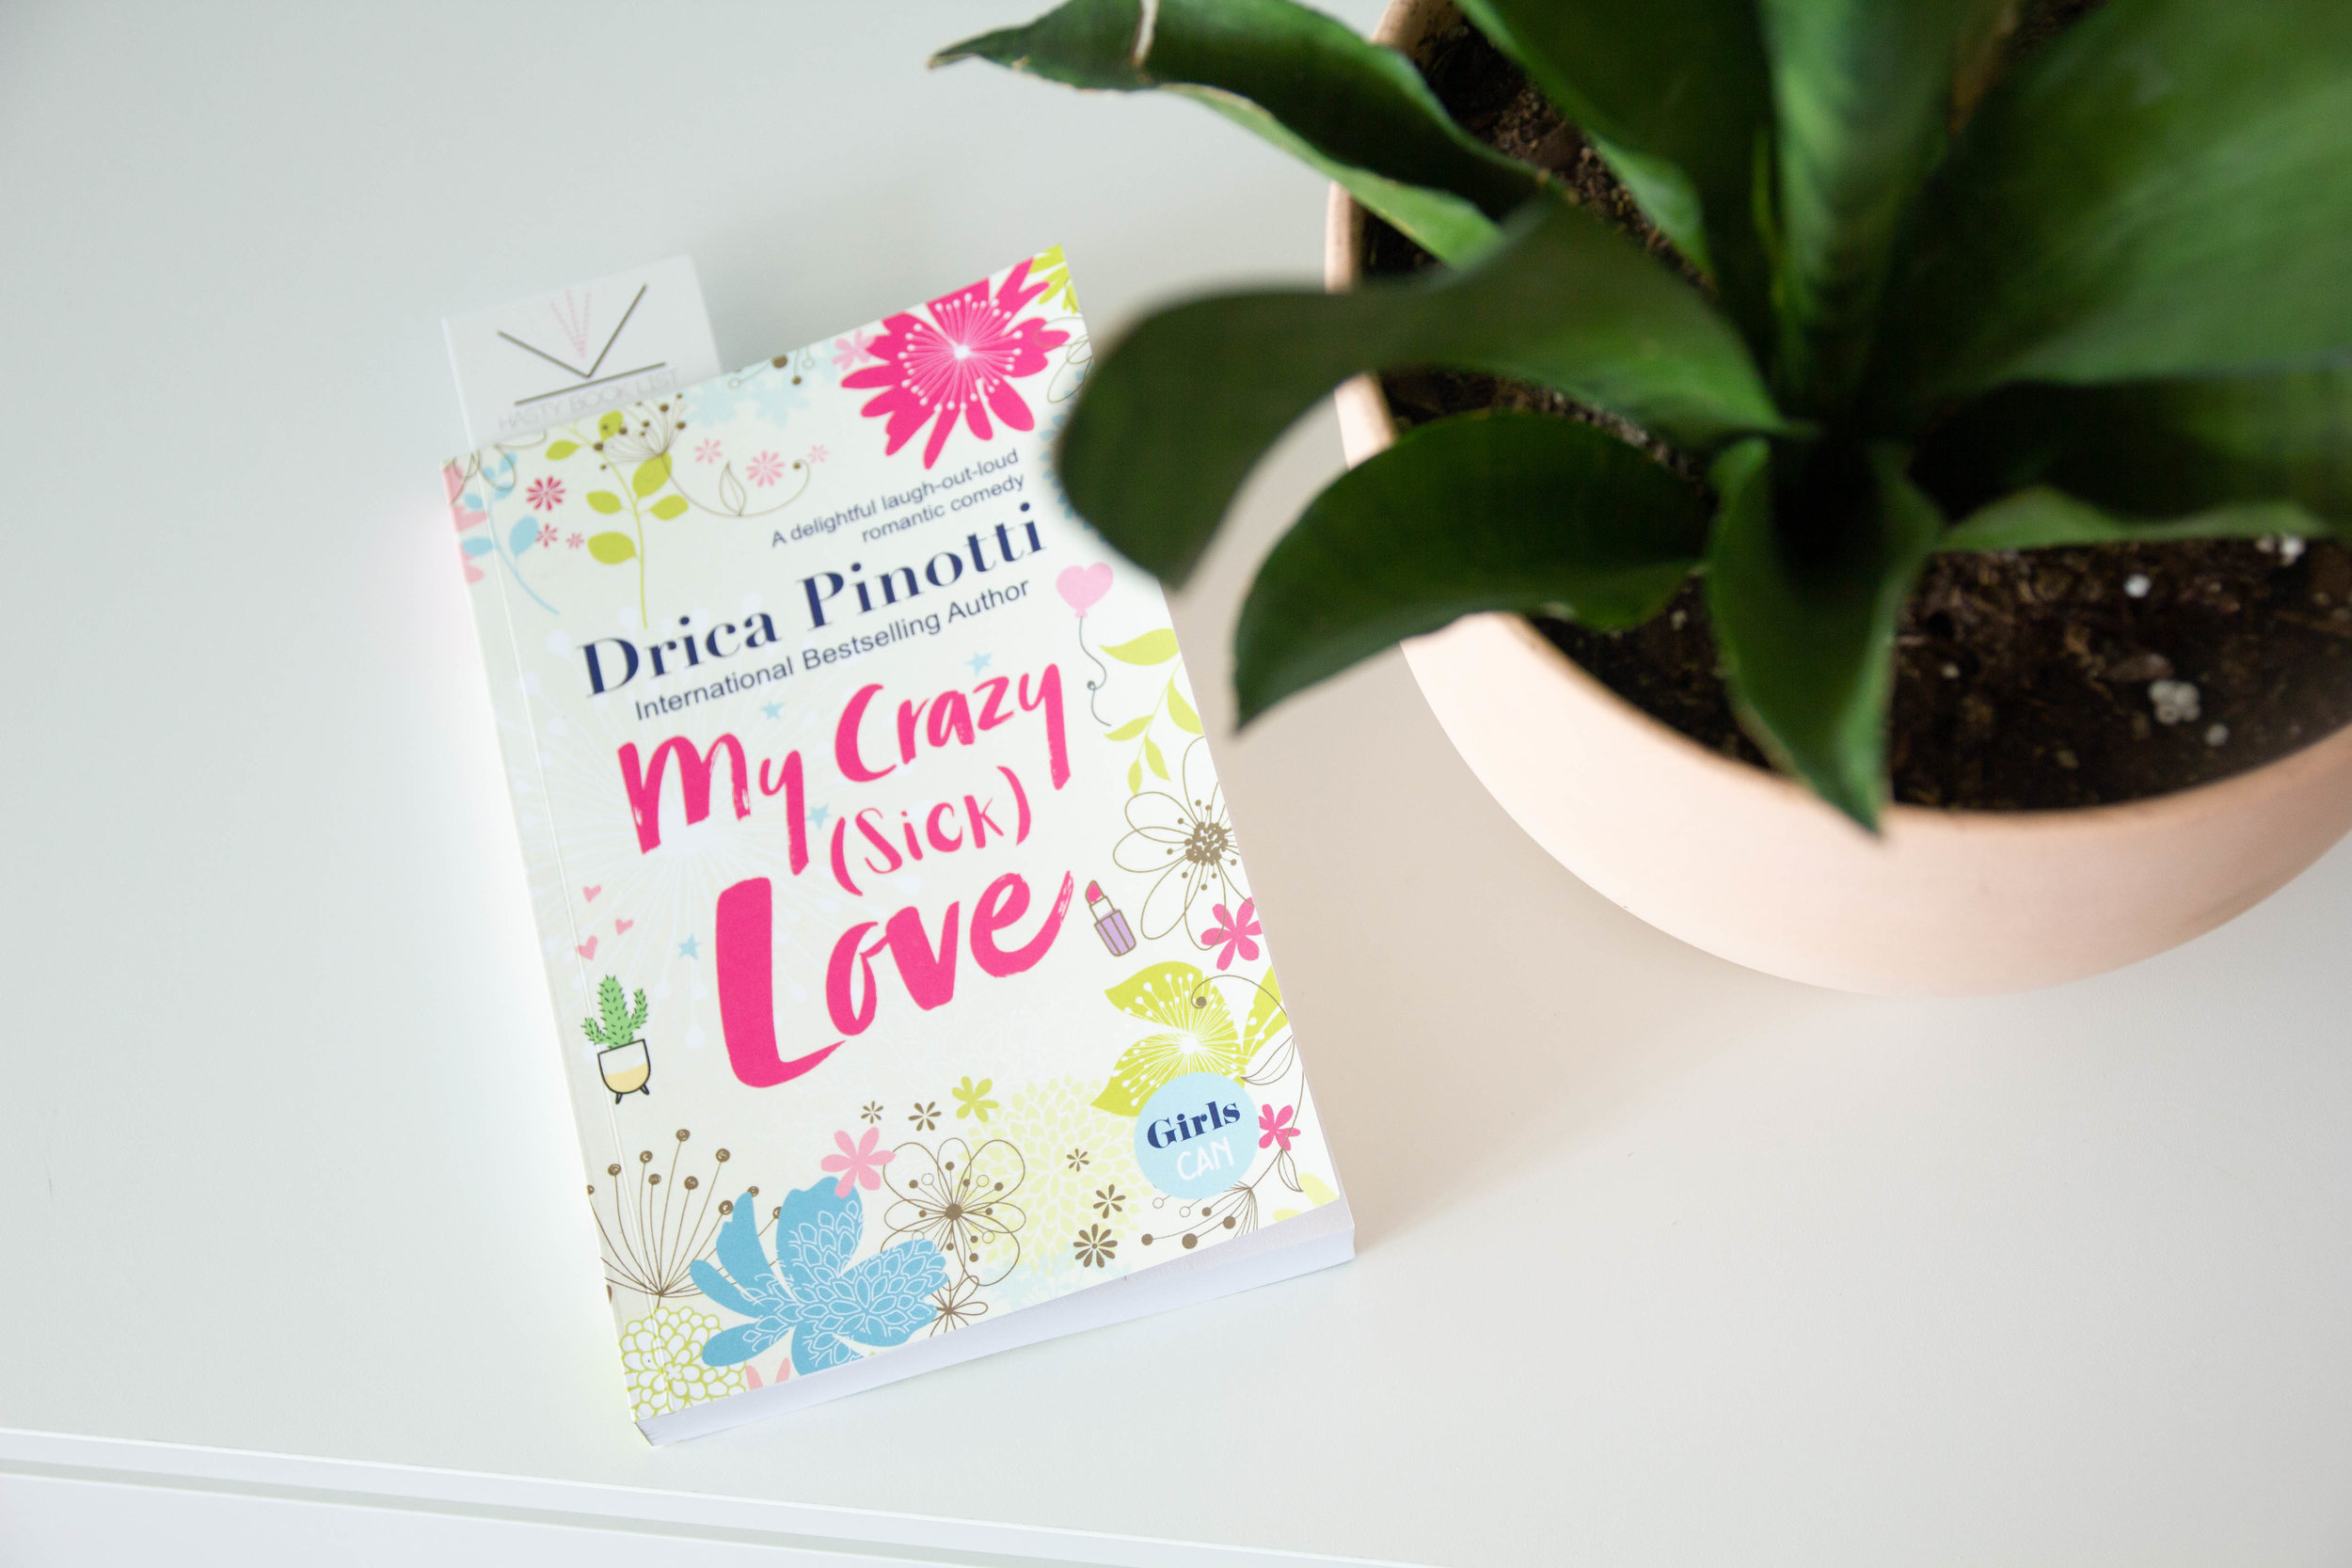 My Crazy (Sick) Love by Drica Pinotti-3.jpg